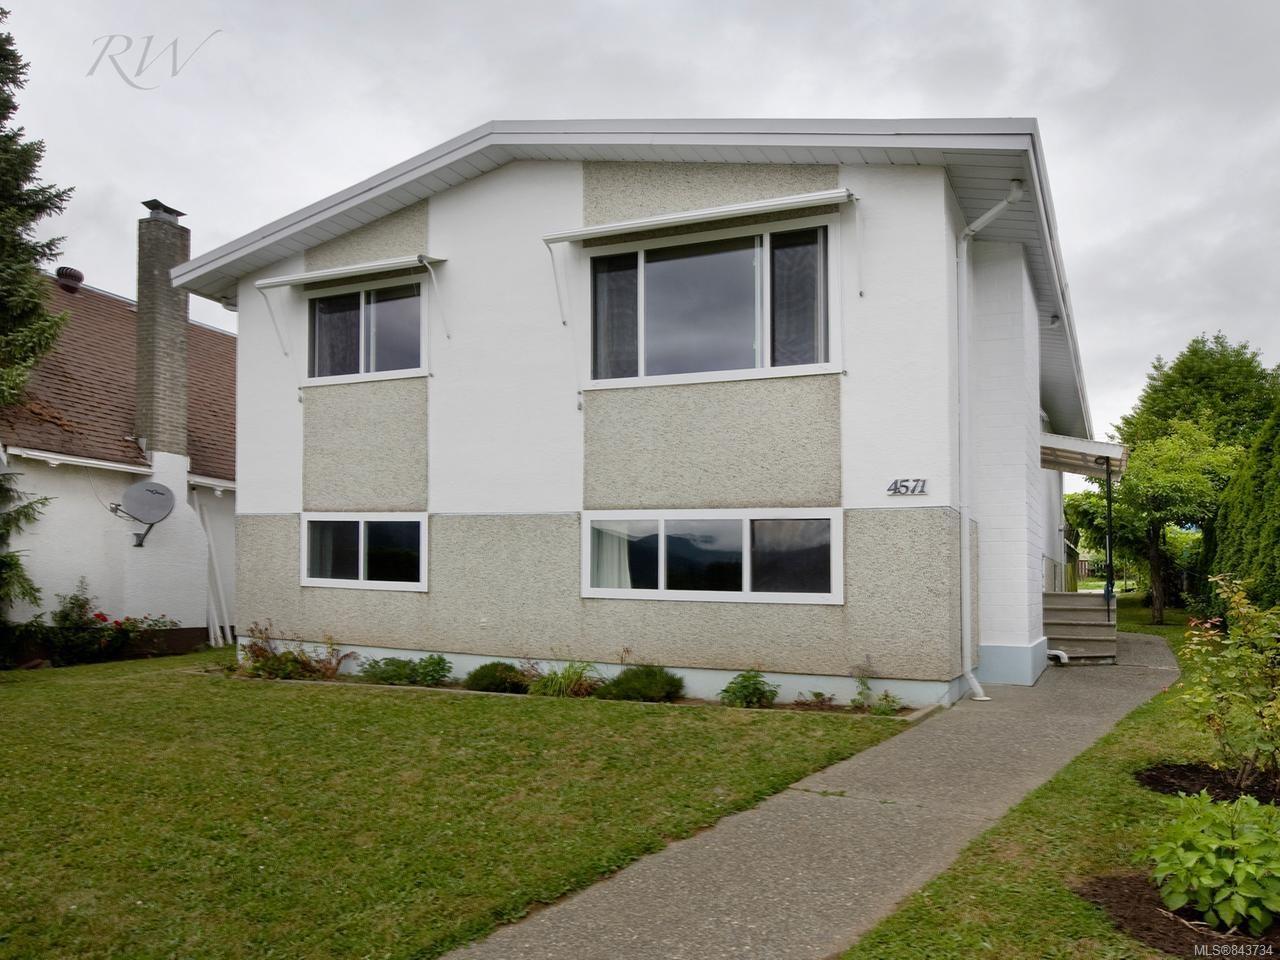 Main Photo: 4571 Redford St in PORT ALBERNI: PA Port Alberni House for sale (Port Alberni)  : MLS®# 843734